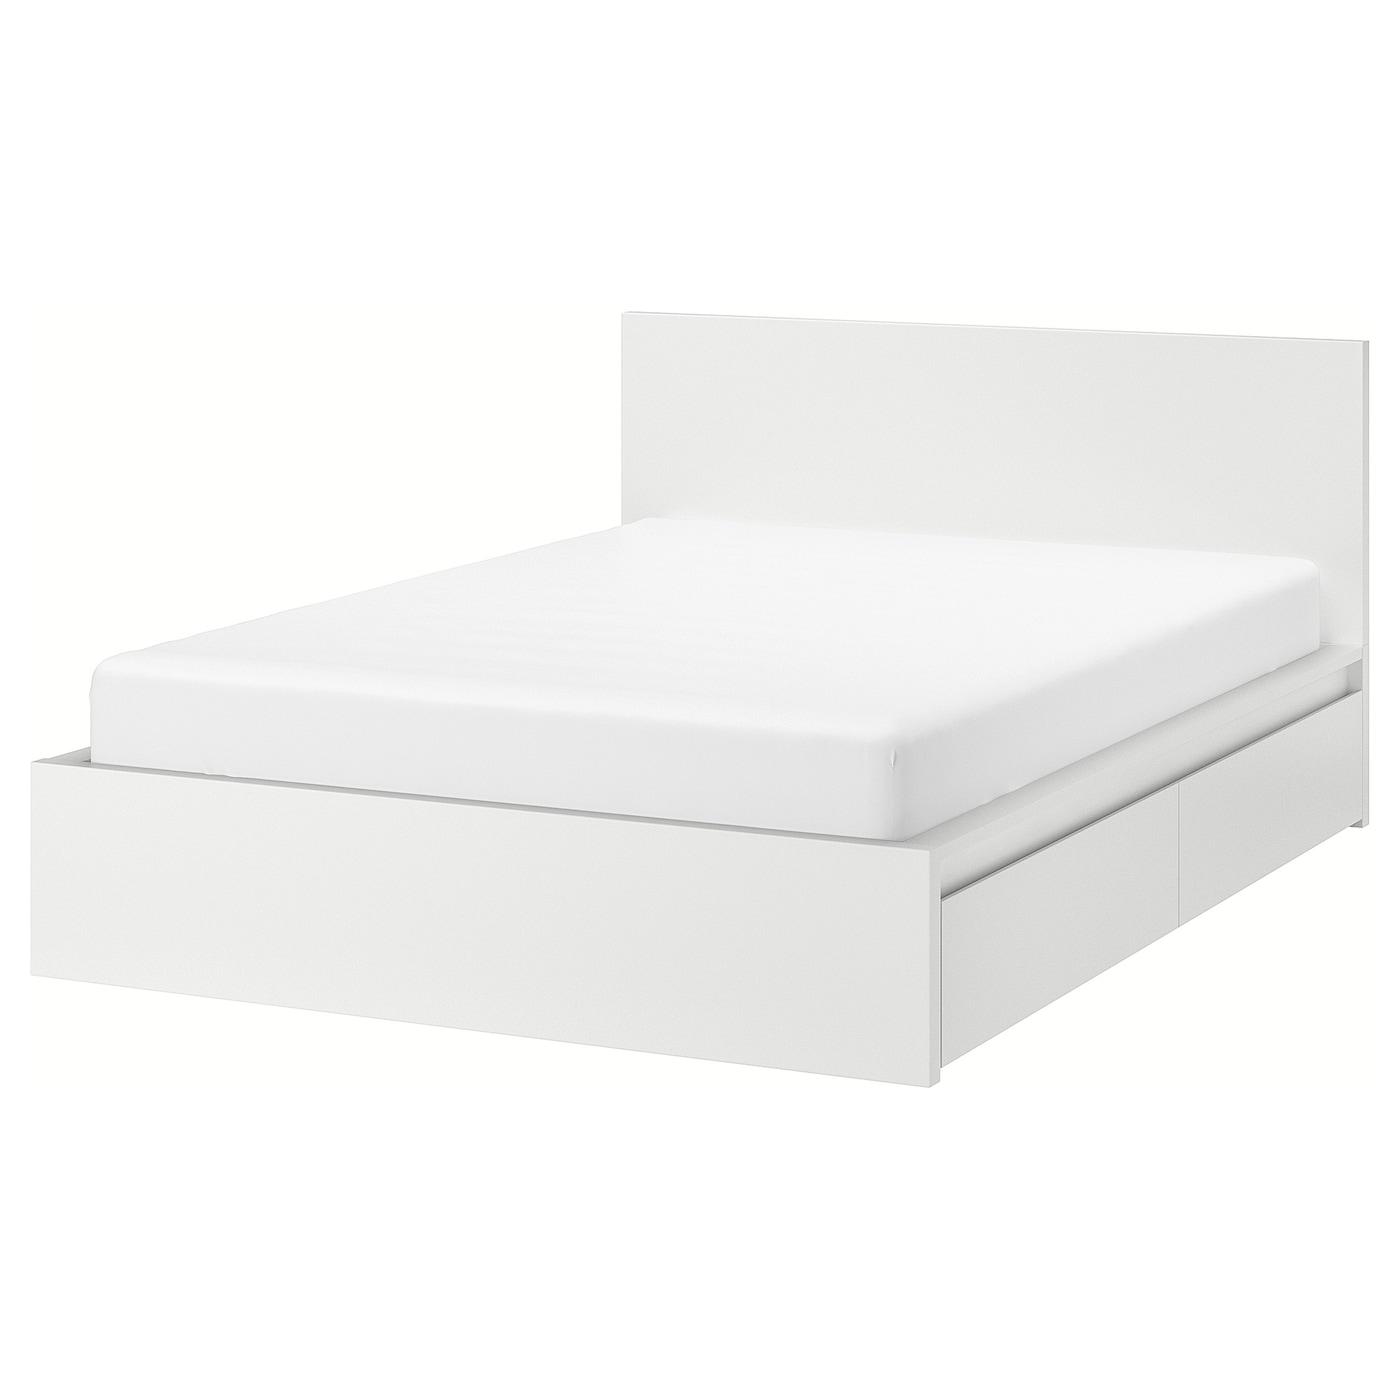 Ikea MALM High bed frame/4 storage boxes, white, LuröyFull